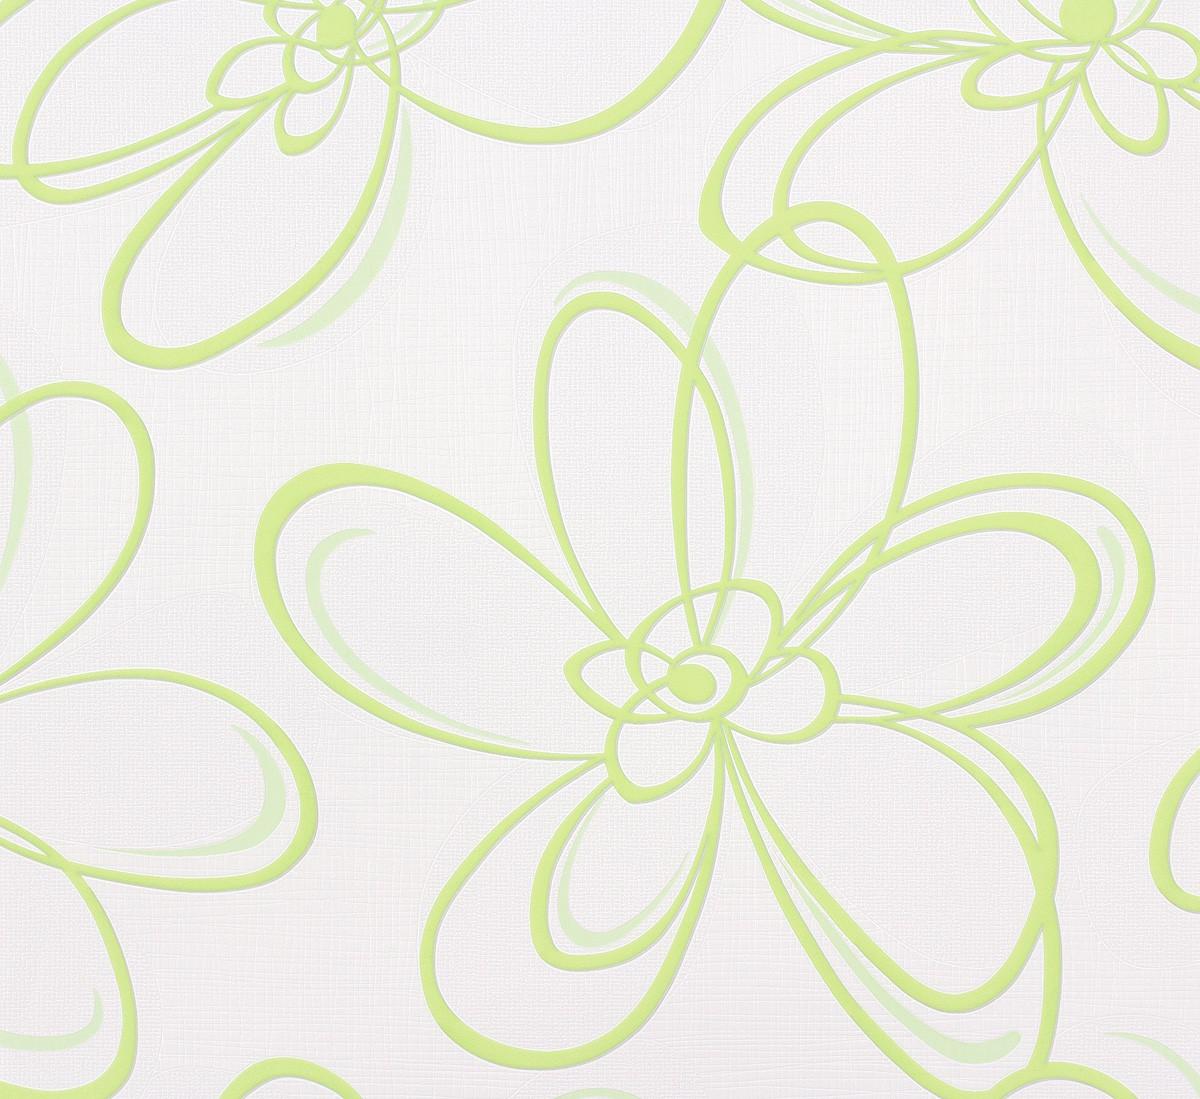 Vliestapete floral abstrakt gr n wei tapeten marburg wohnsinn 55610 - Tapeten holzoptik weiss ...